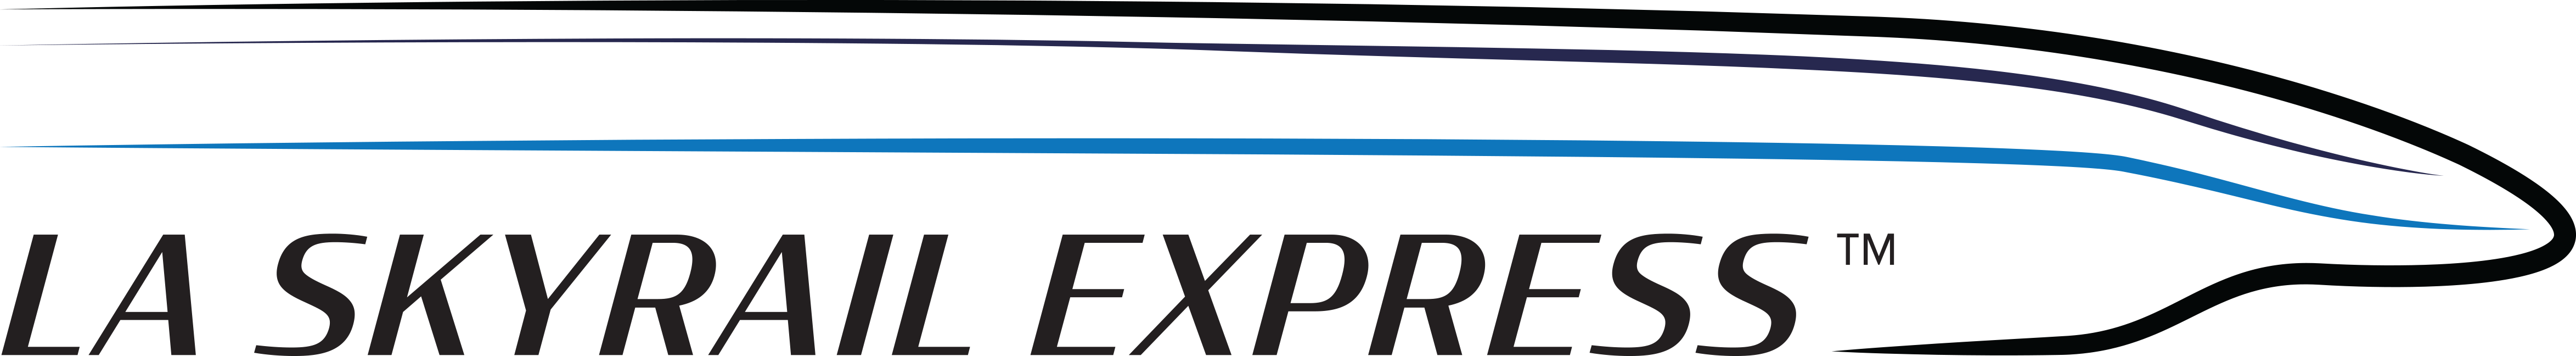 LA SkyRail Express